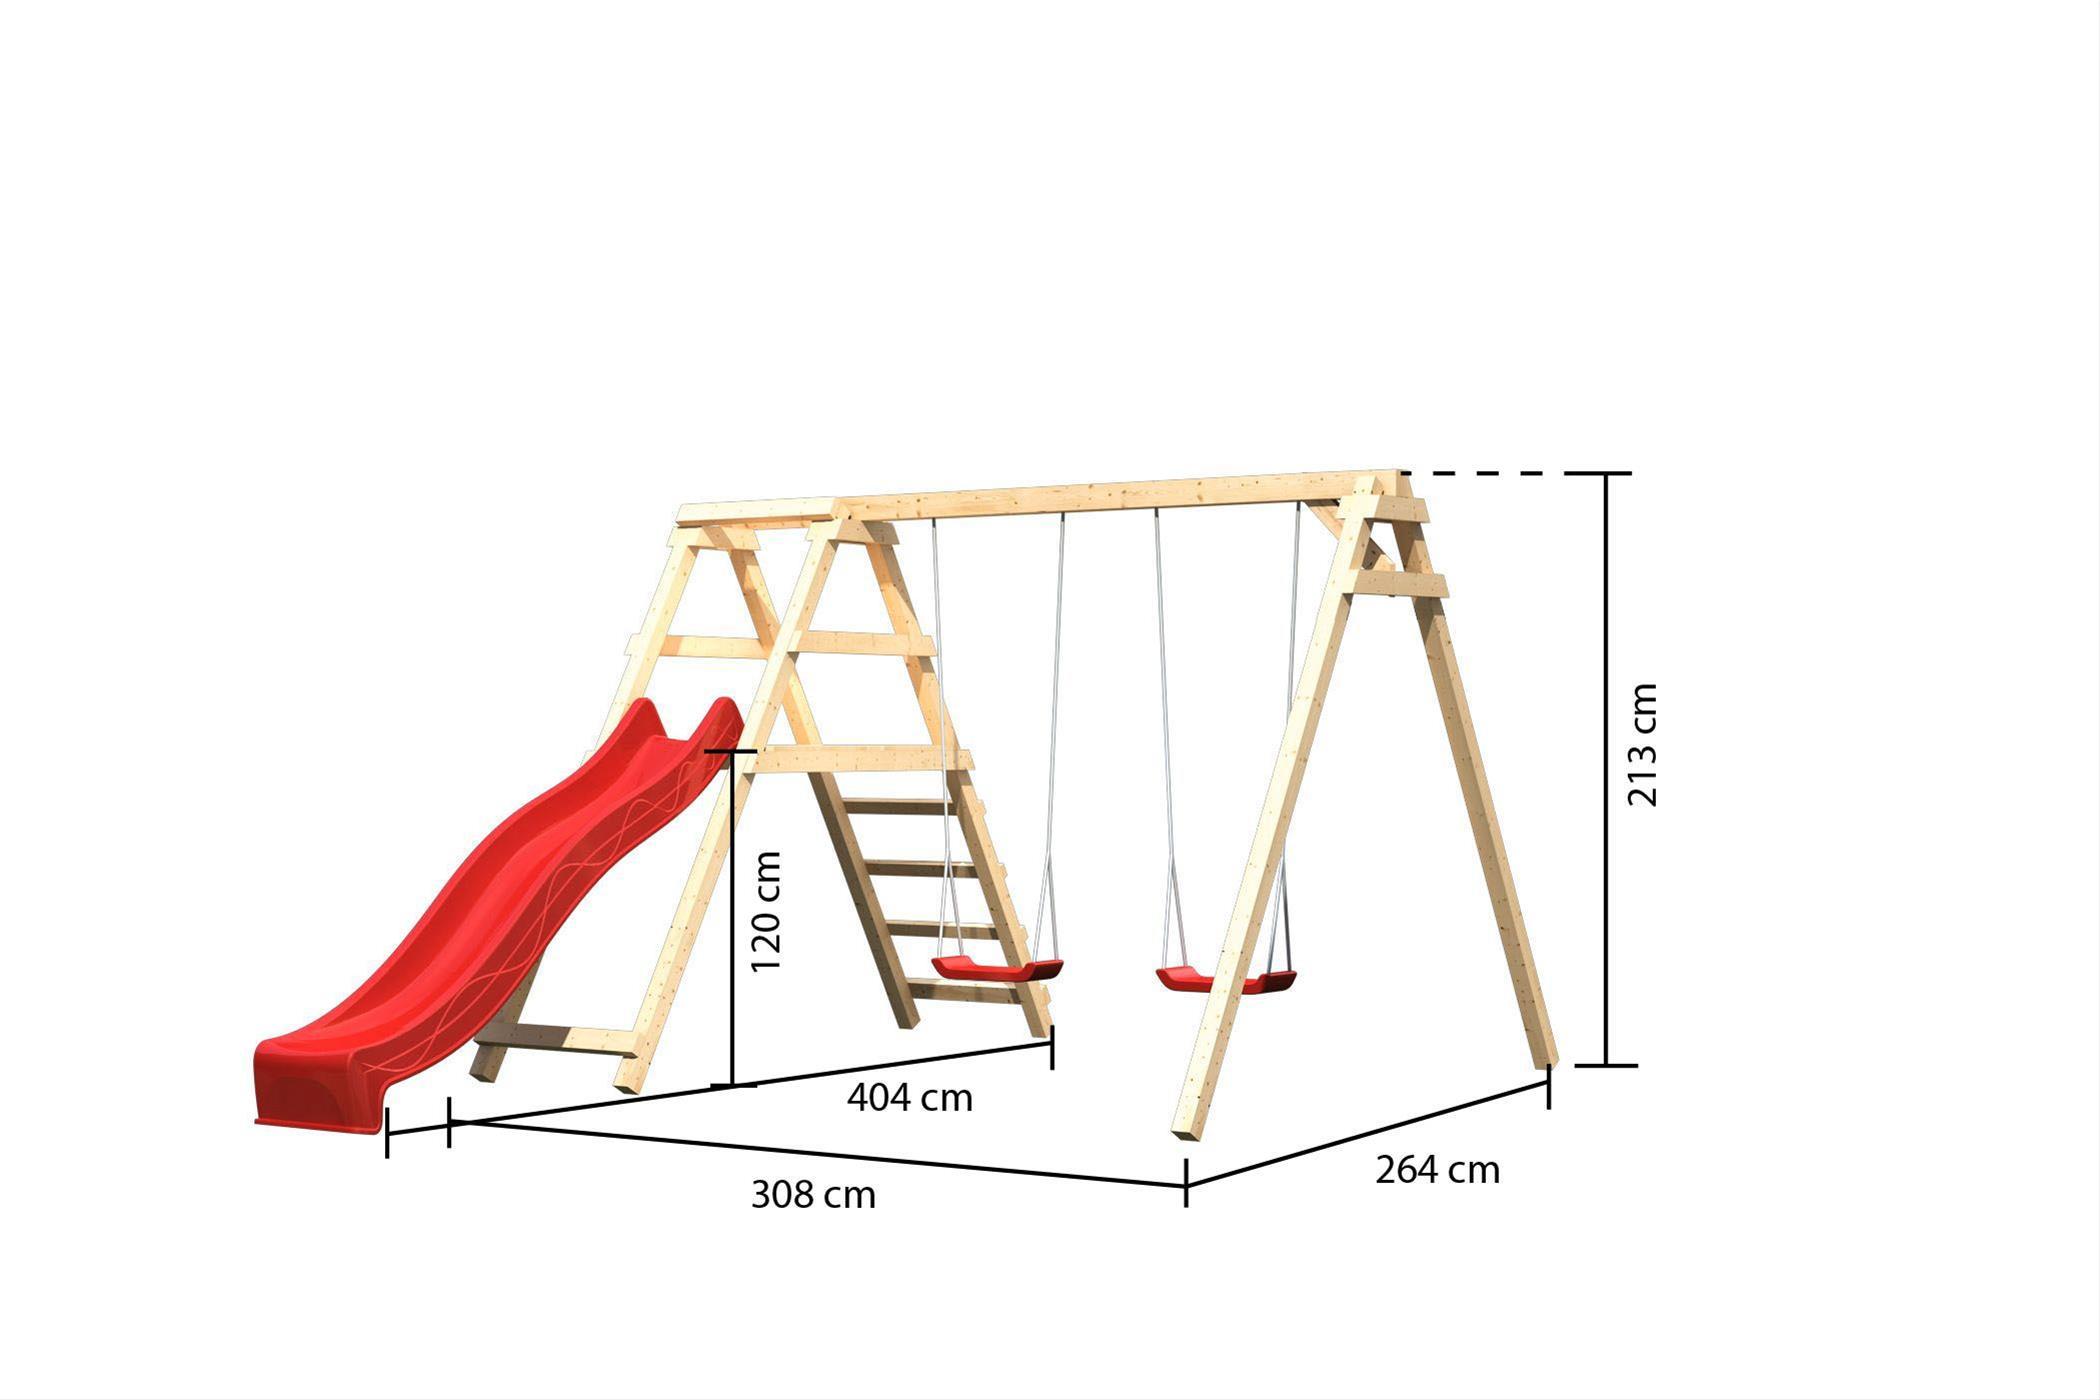 Klettergerüst Stahl : Doppelschaukel mit klettergerüst karibu akubi felix rutsche rot